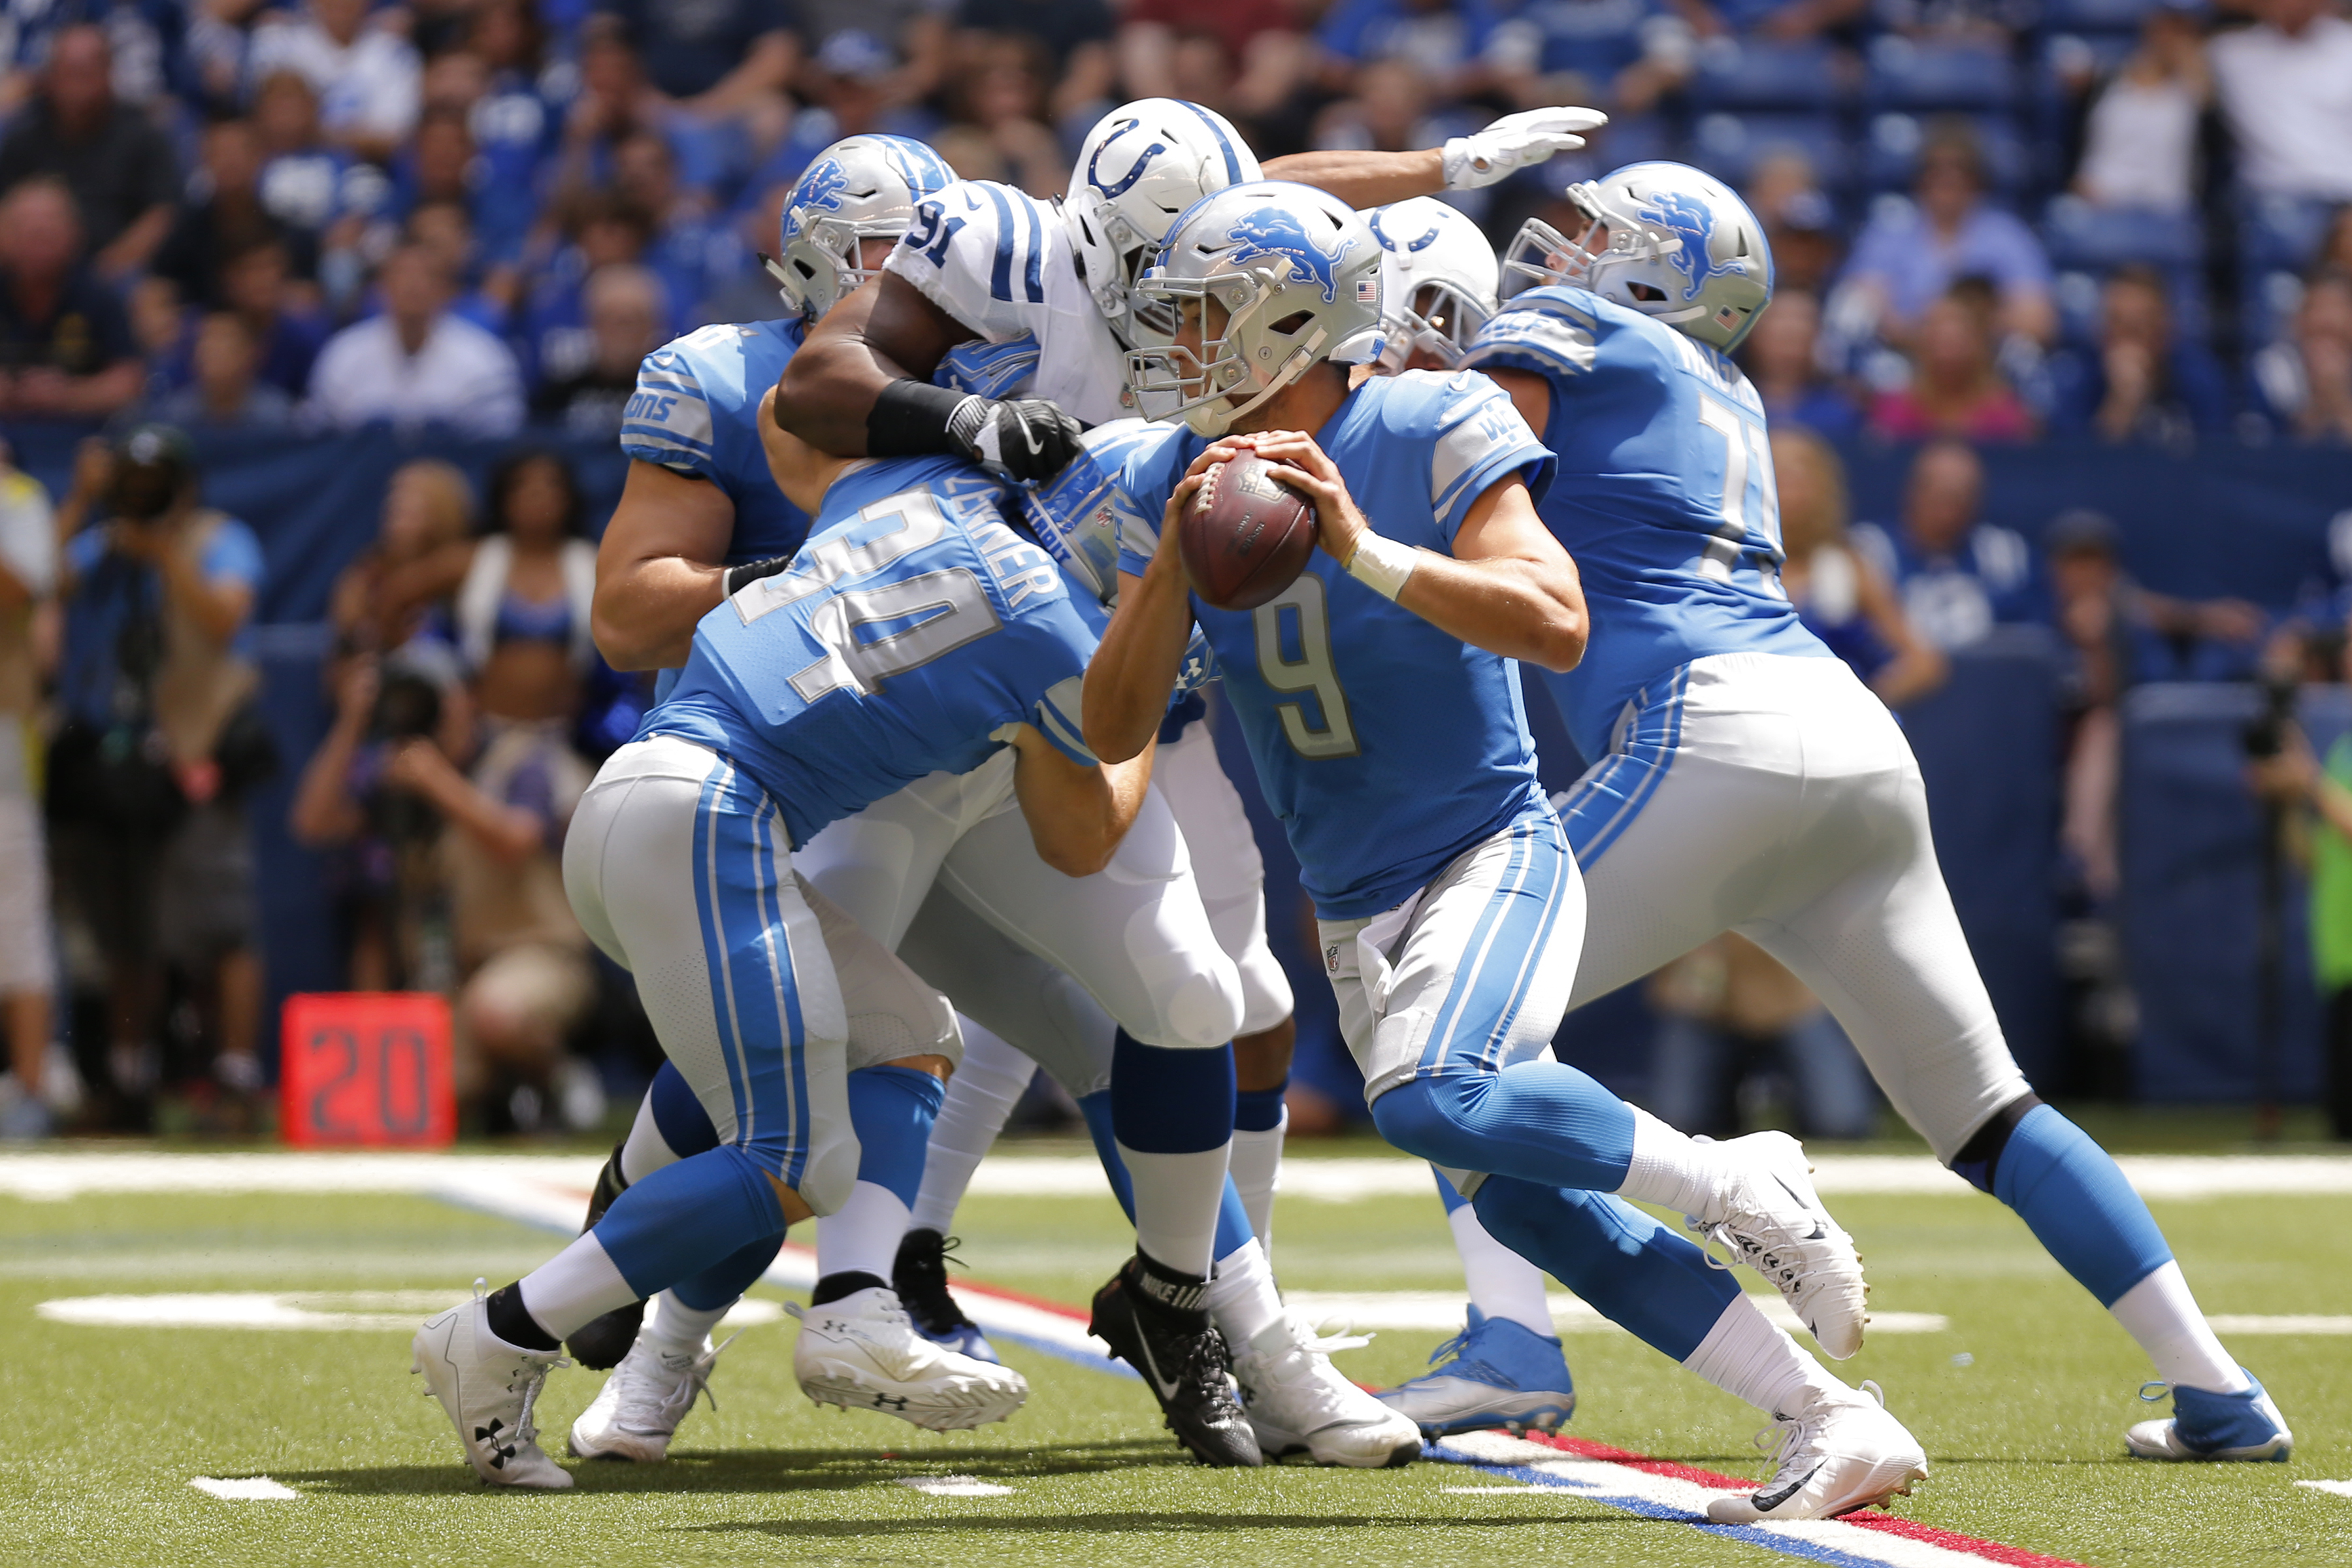 NFL: AUG 13 Preseason - Lions at Colts